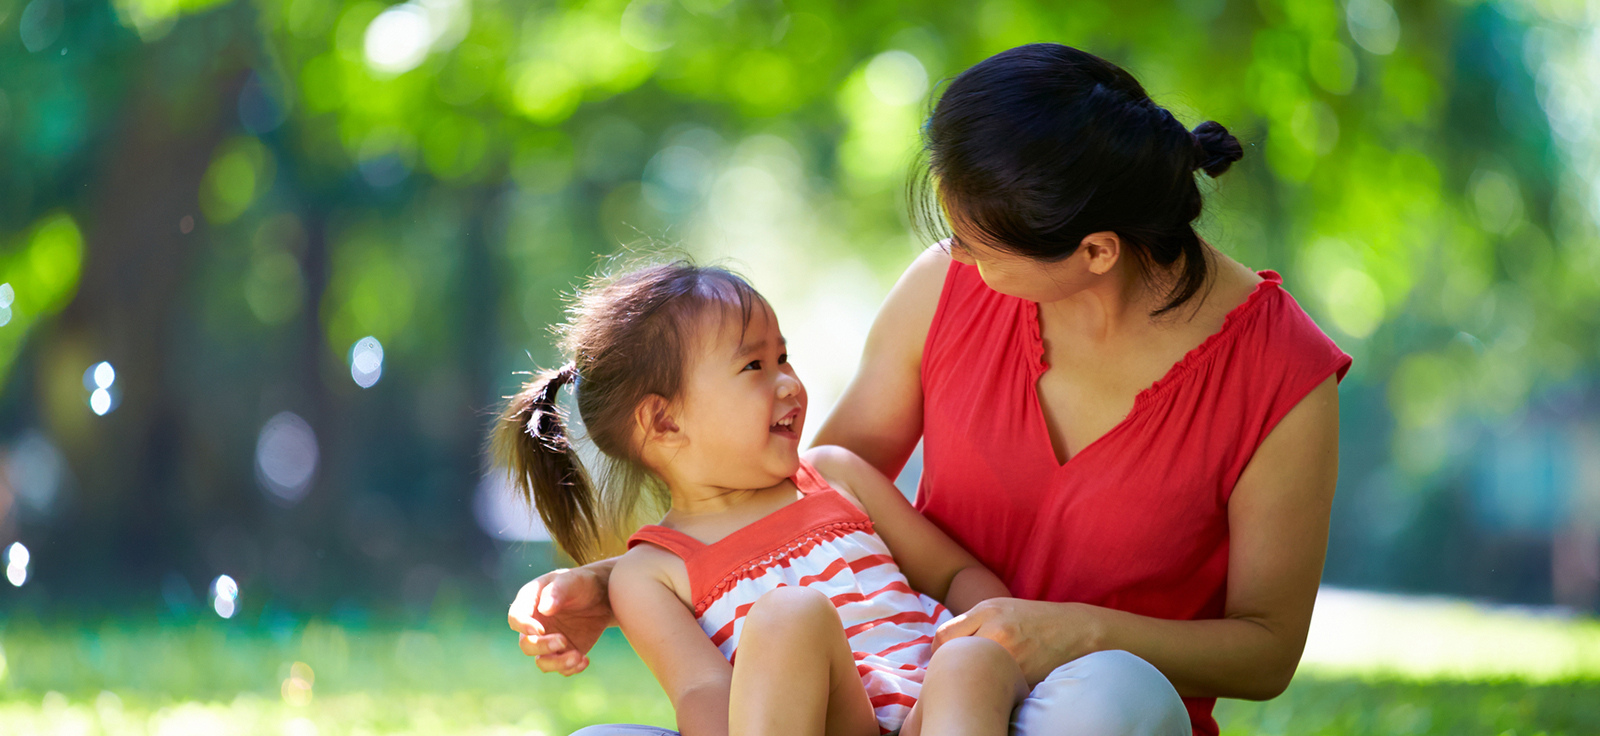 Child smiling at mom